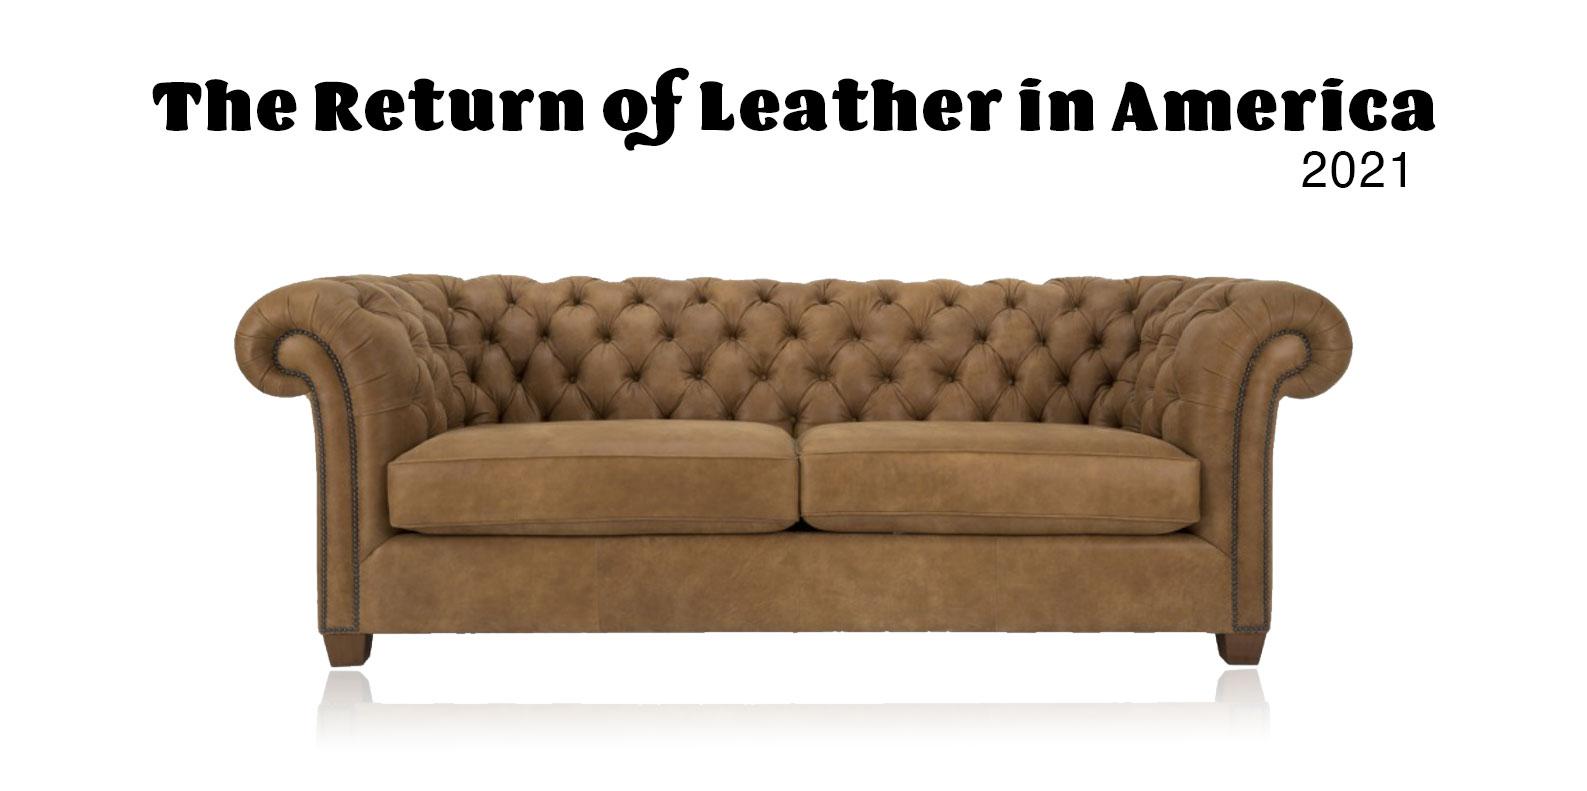 The Return of Leather in America 2021 | Furniture